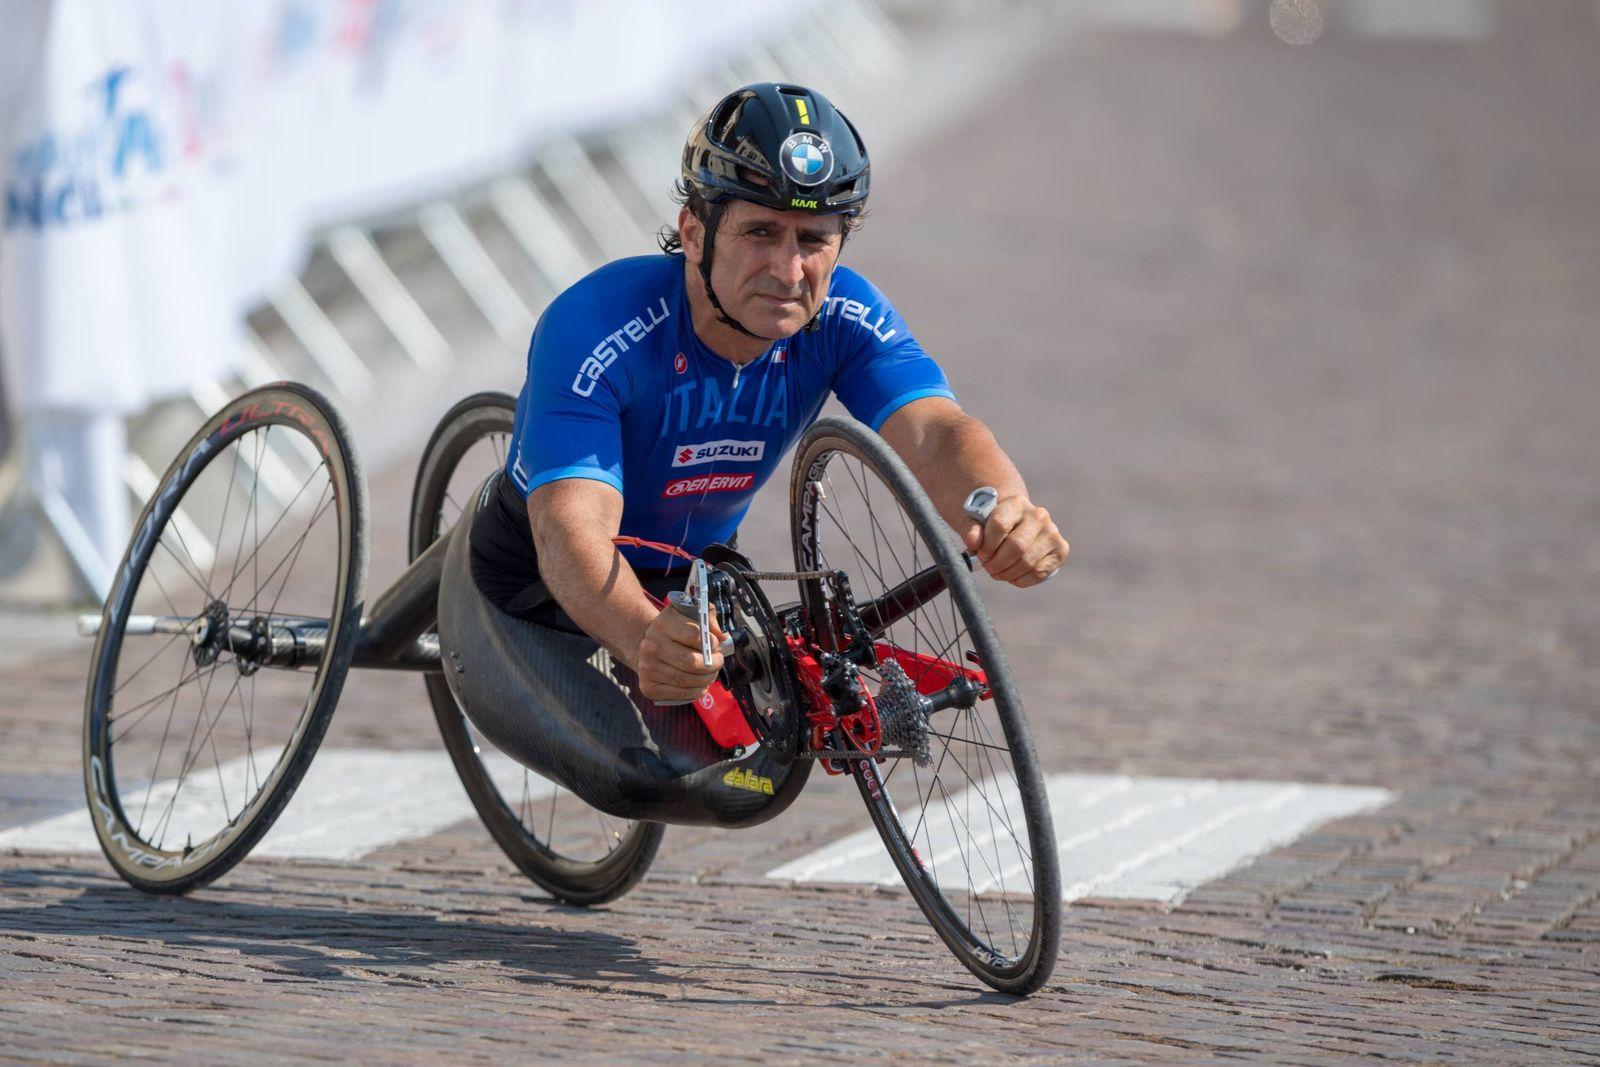 UCI Para Cycling Road World Championships 2018 - August 1, 2018 MANIAGO, ITALY - AUGUST 01: Alex Zanardi (ITA) at Day 0